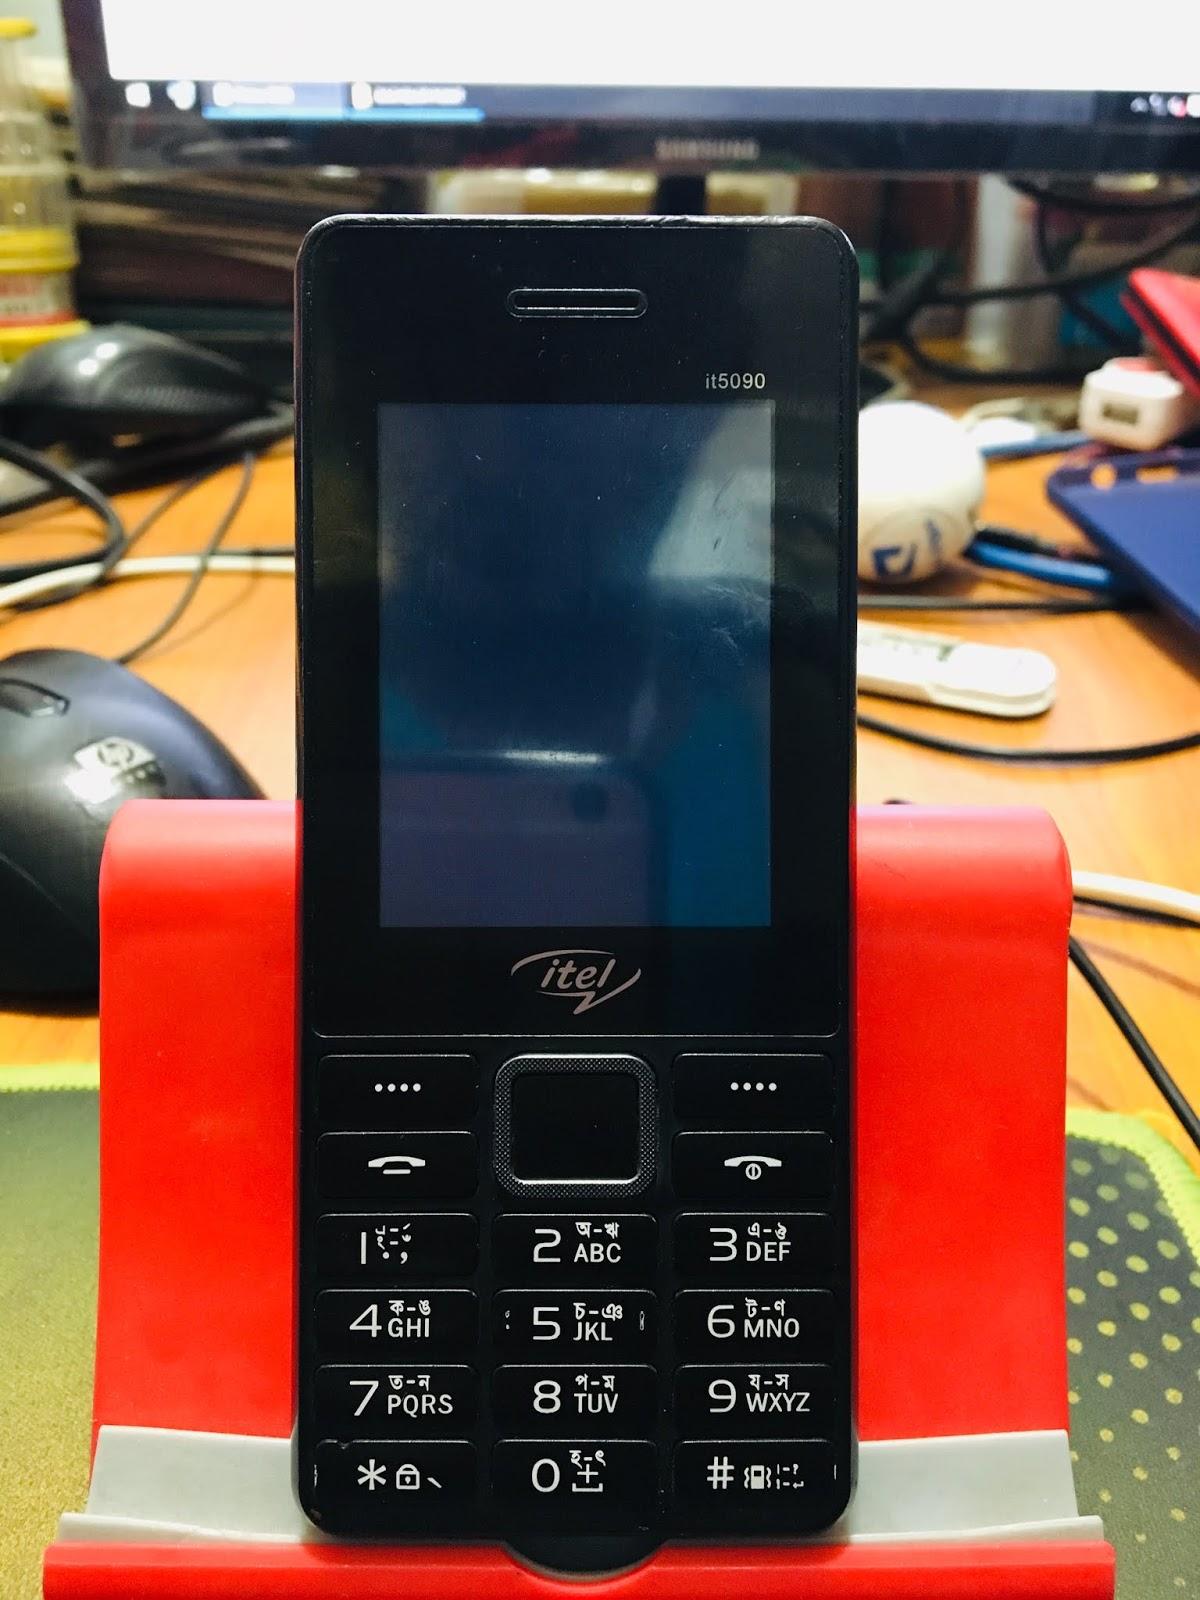 Itel It5090 Flash File (Stock Rom) Firmware - Mobile Flash File Free